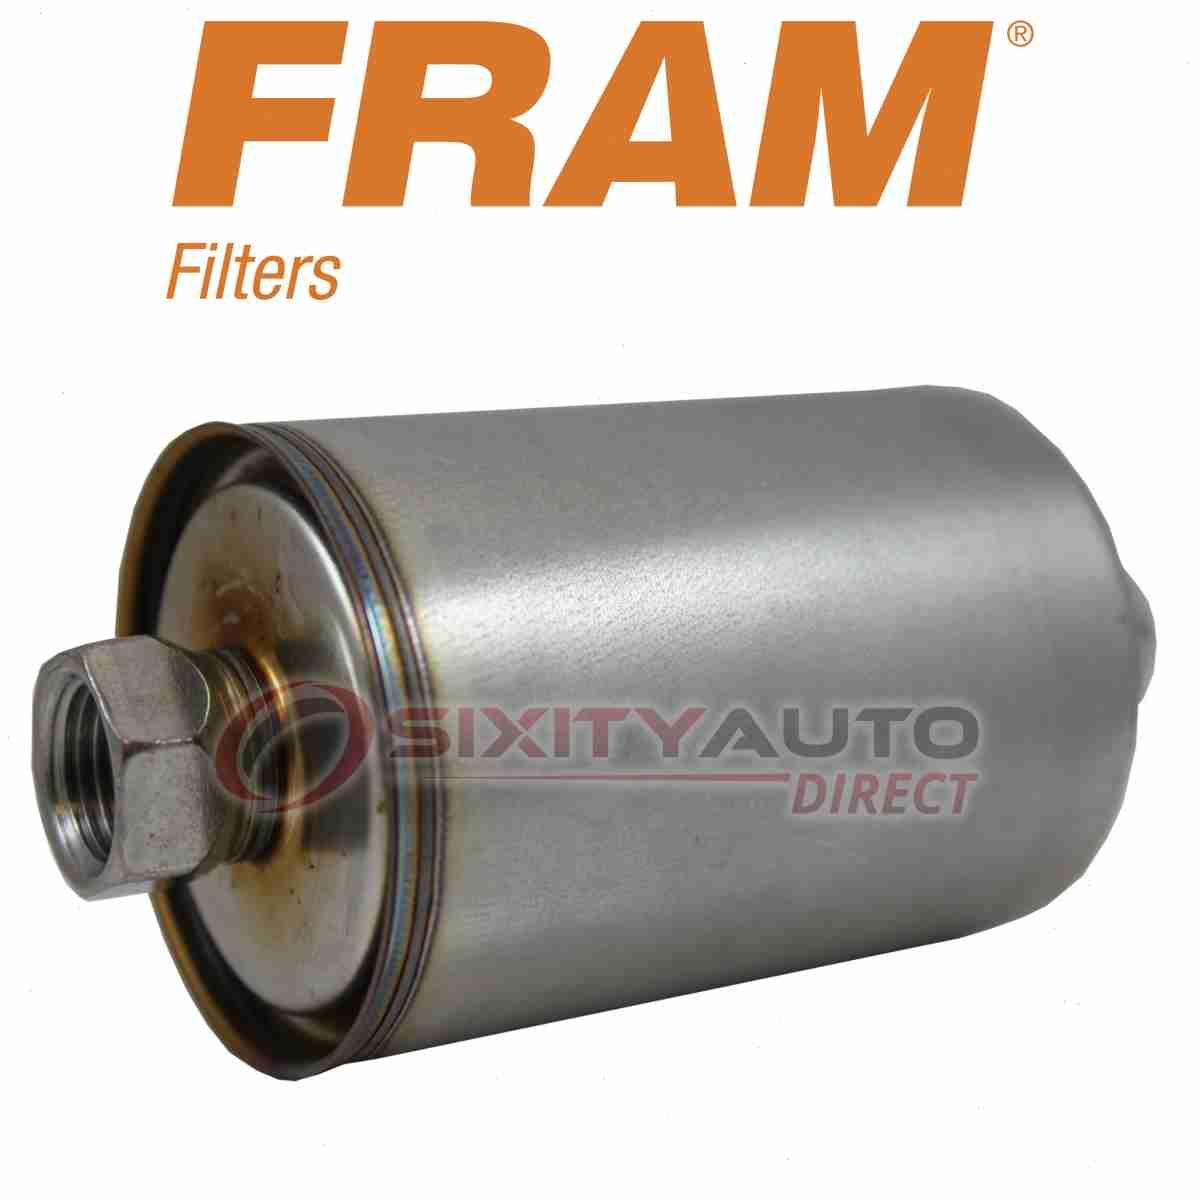 FRAM Fuel Filter for 2000-2003 GMC Yukon XL 1500 5.3L V8 - Gas Pump Line  Air xv   eBayeBay